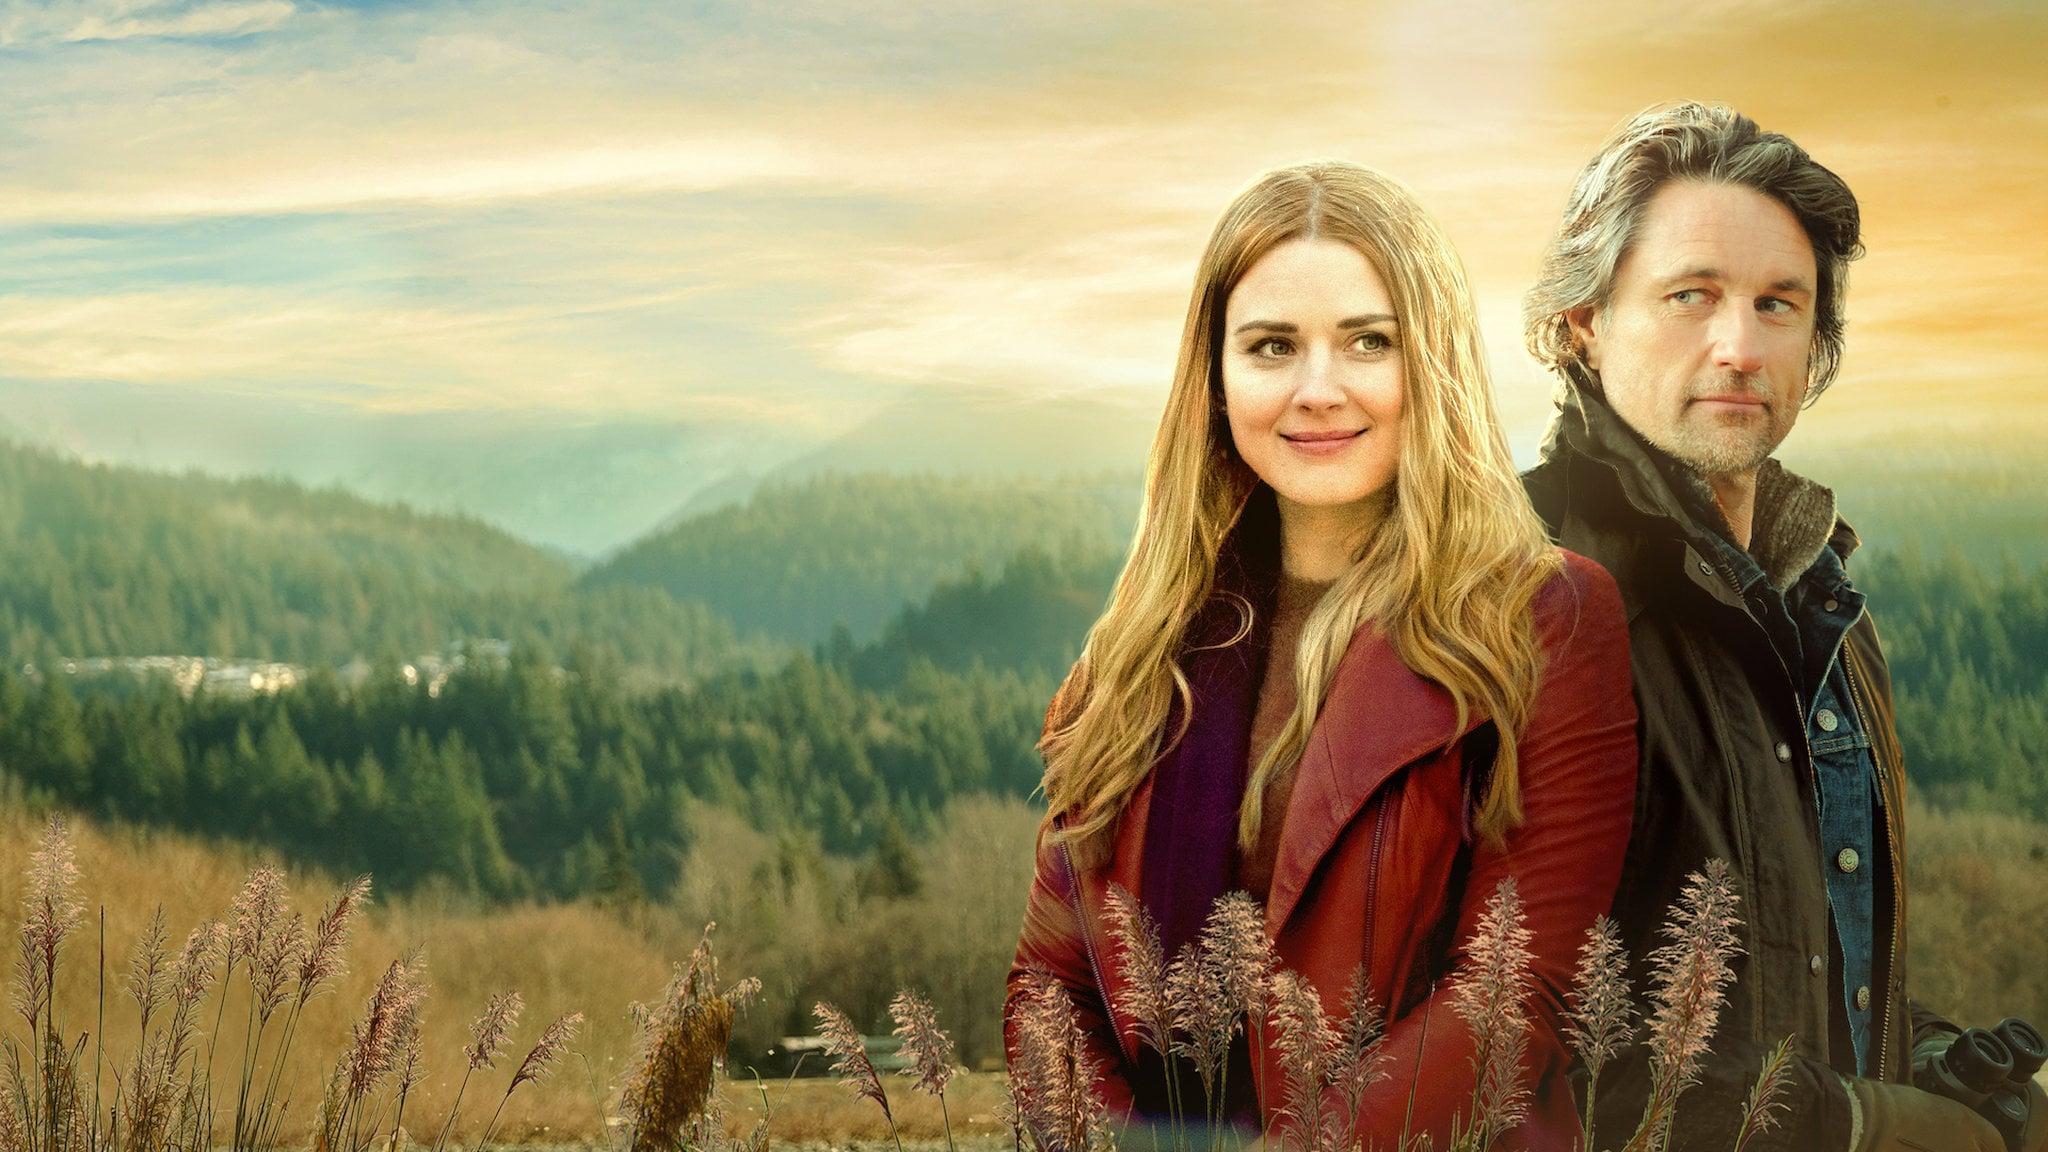 Netflix to drop Virgin River Season 3 soon